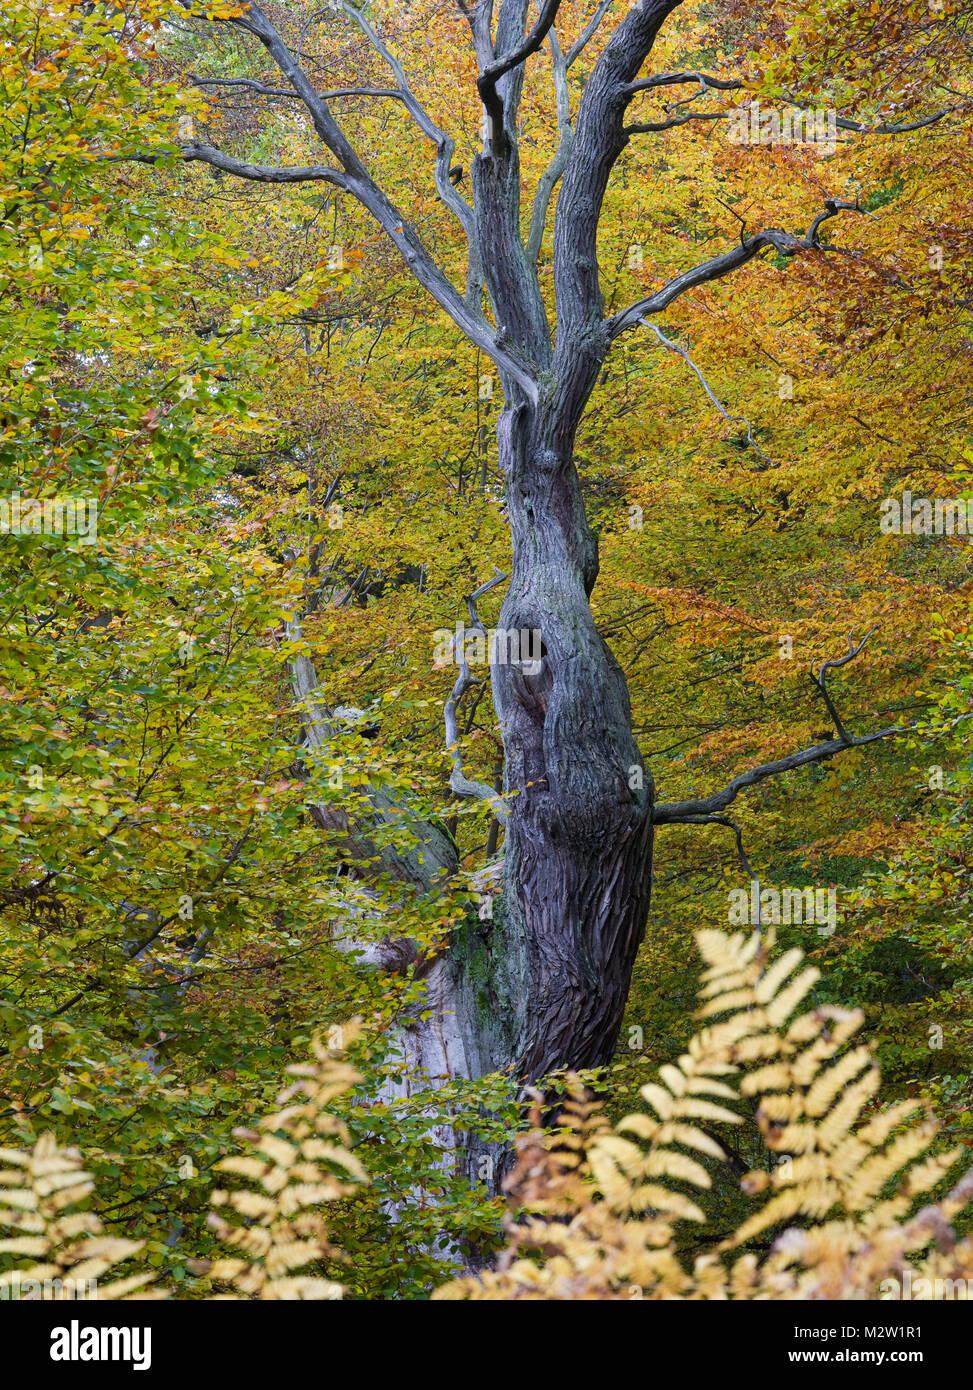 Oak in autumn, Urwald Sababurg, Reinhardswald, Hessia, Germany - Stock Image